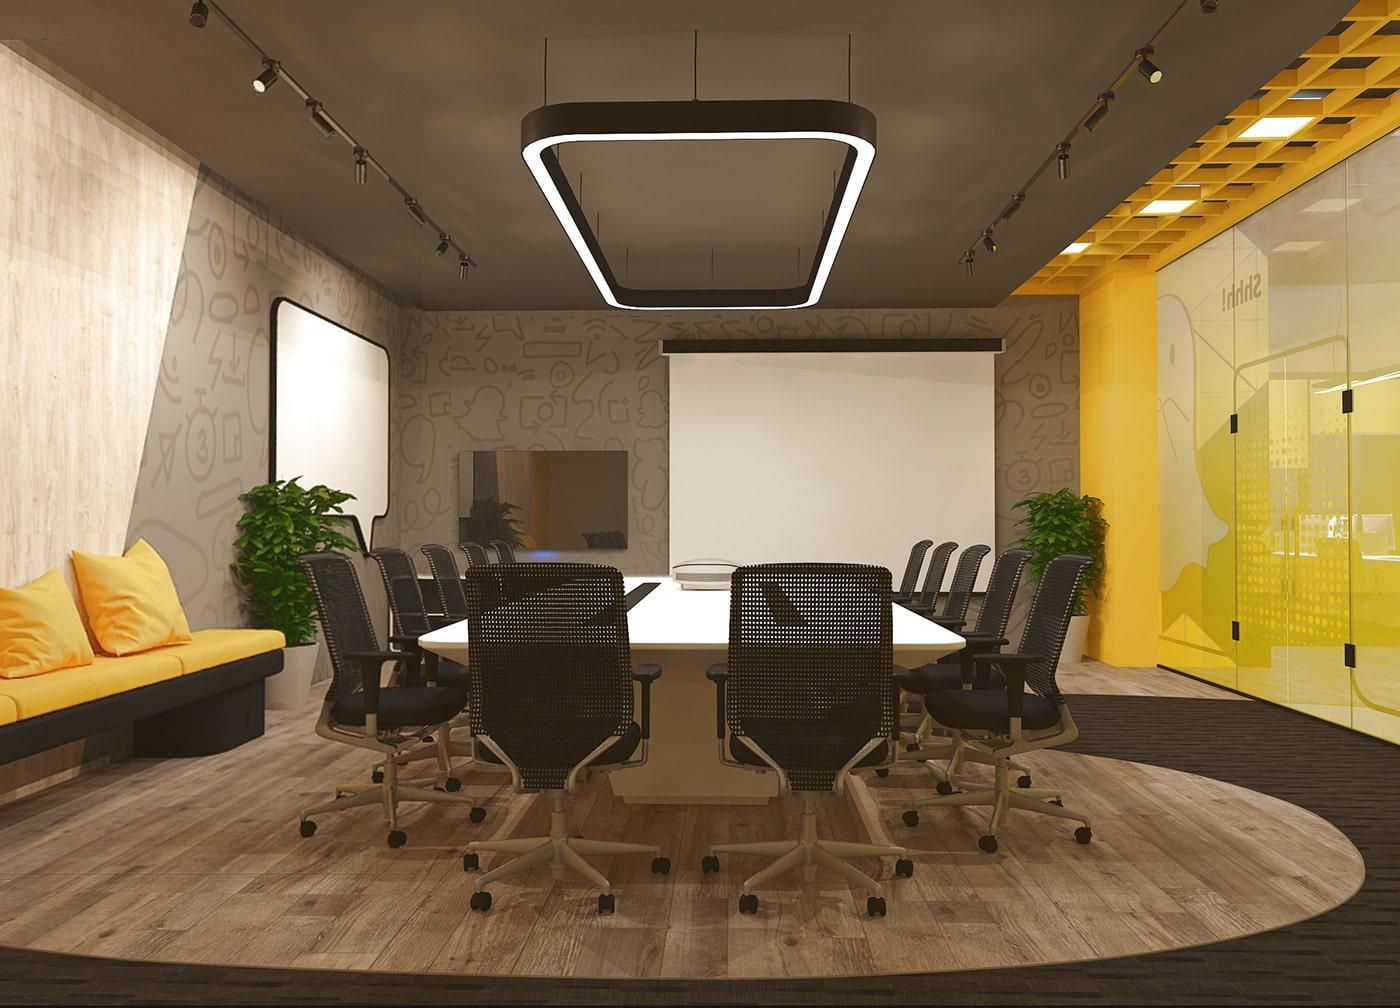 İzunex Ofis Tasarımı